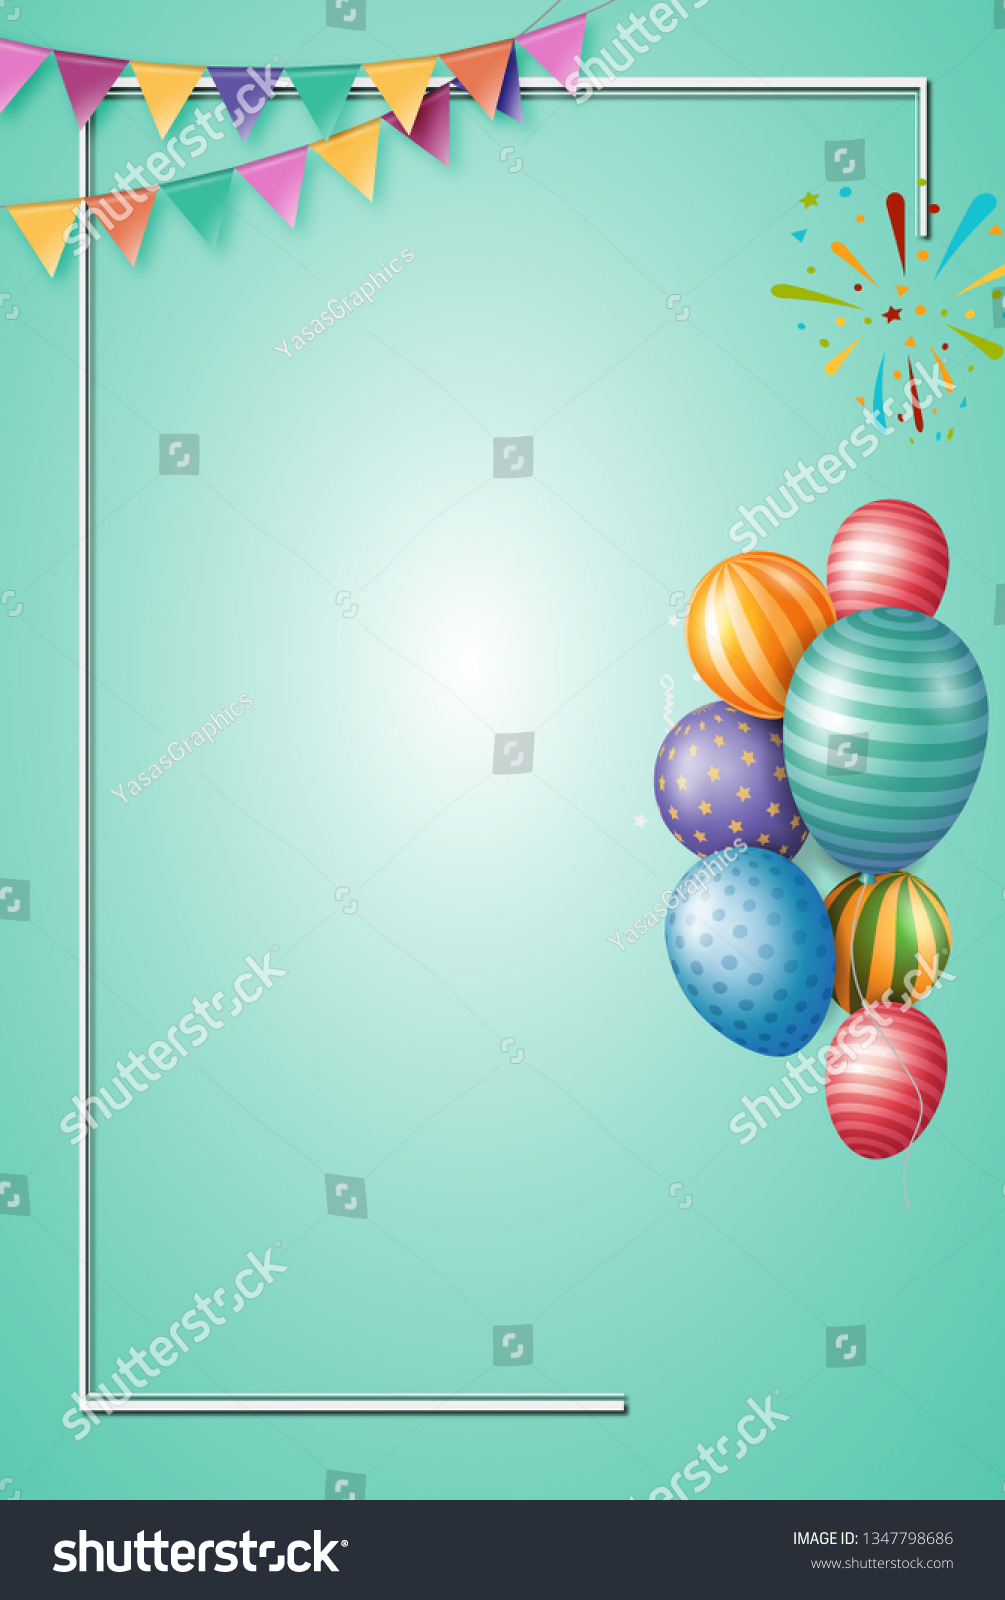 https www shutterstock com image illustration birthday invitation card background 1347798686